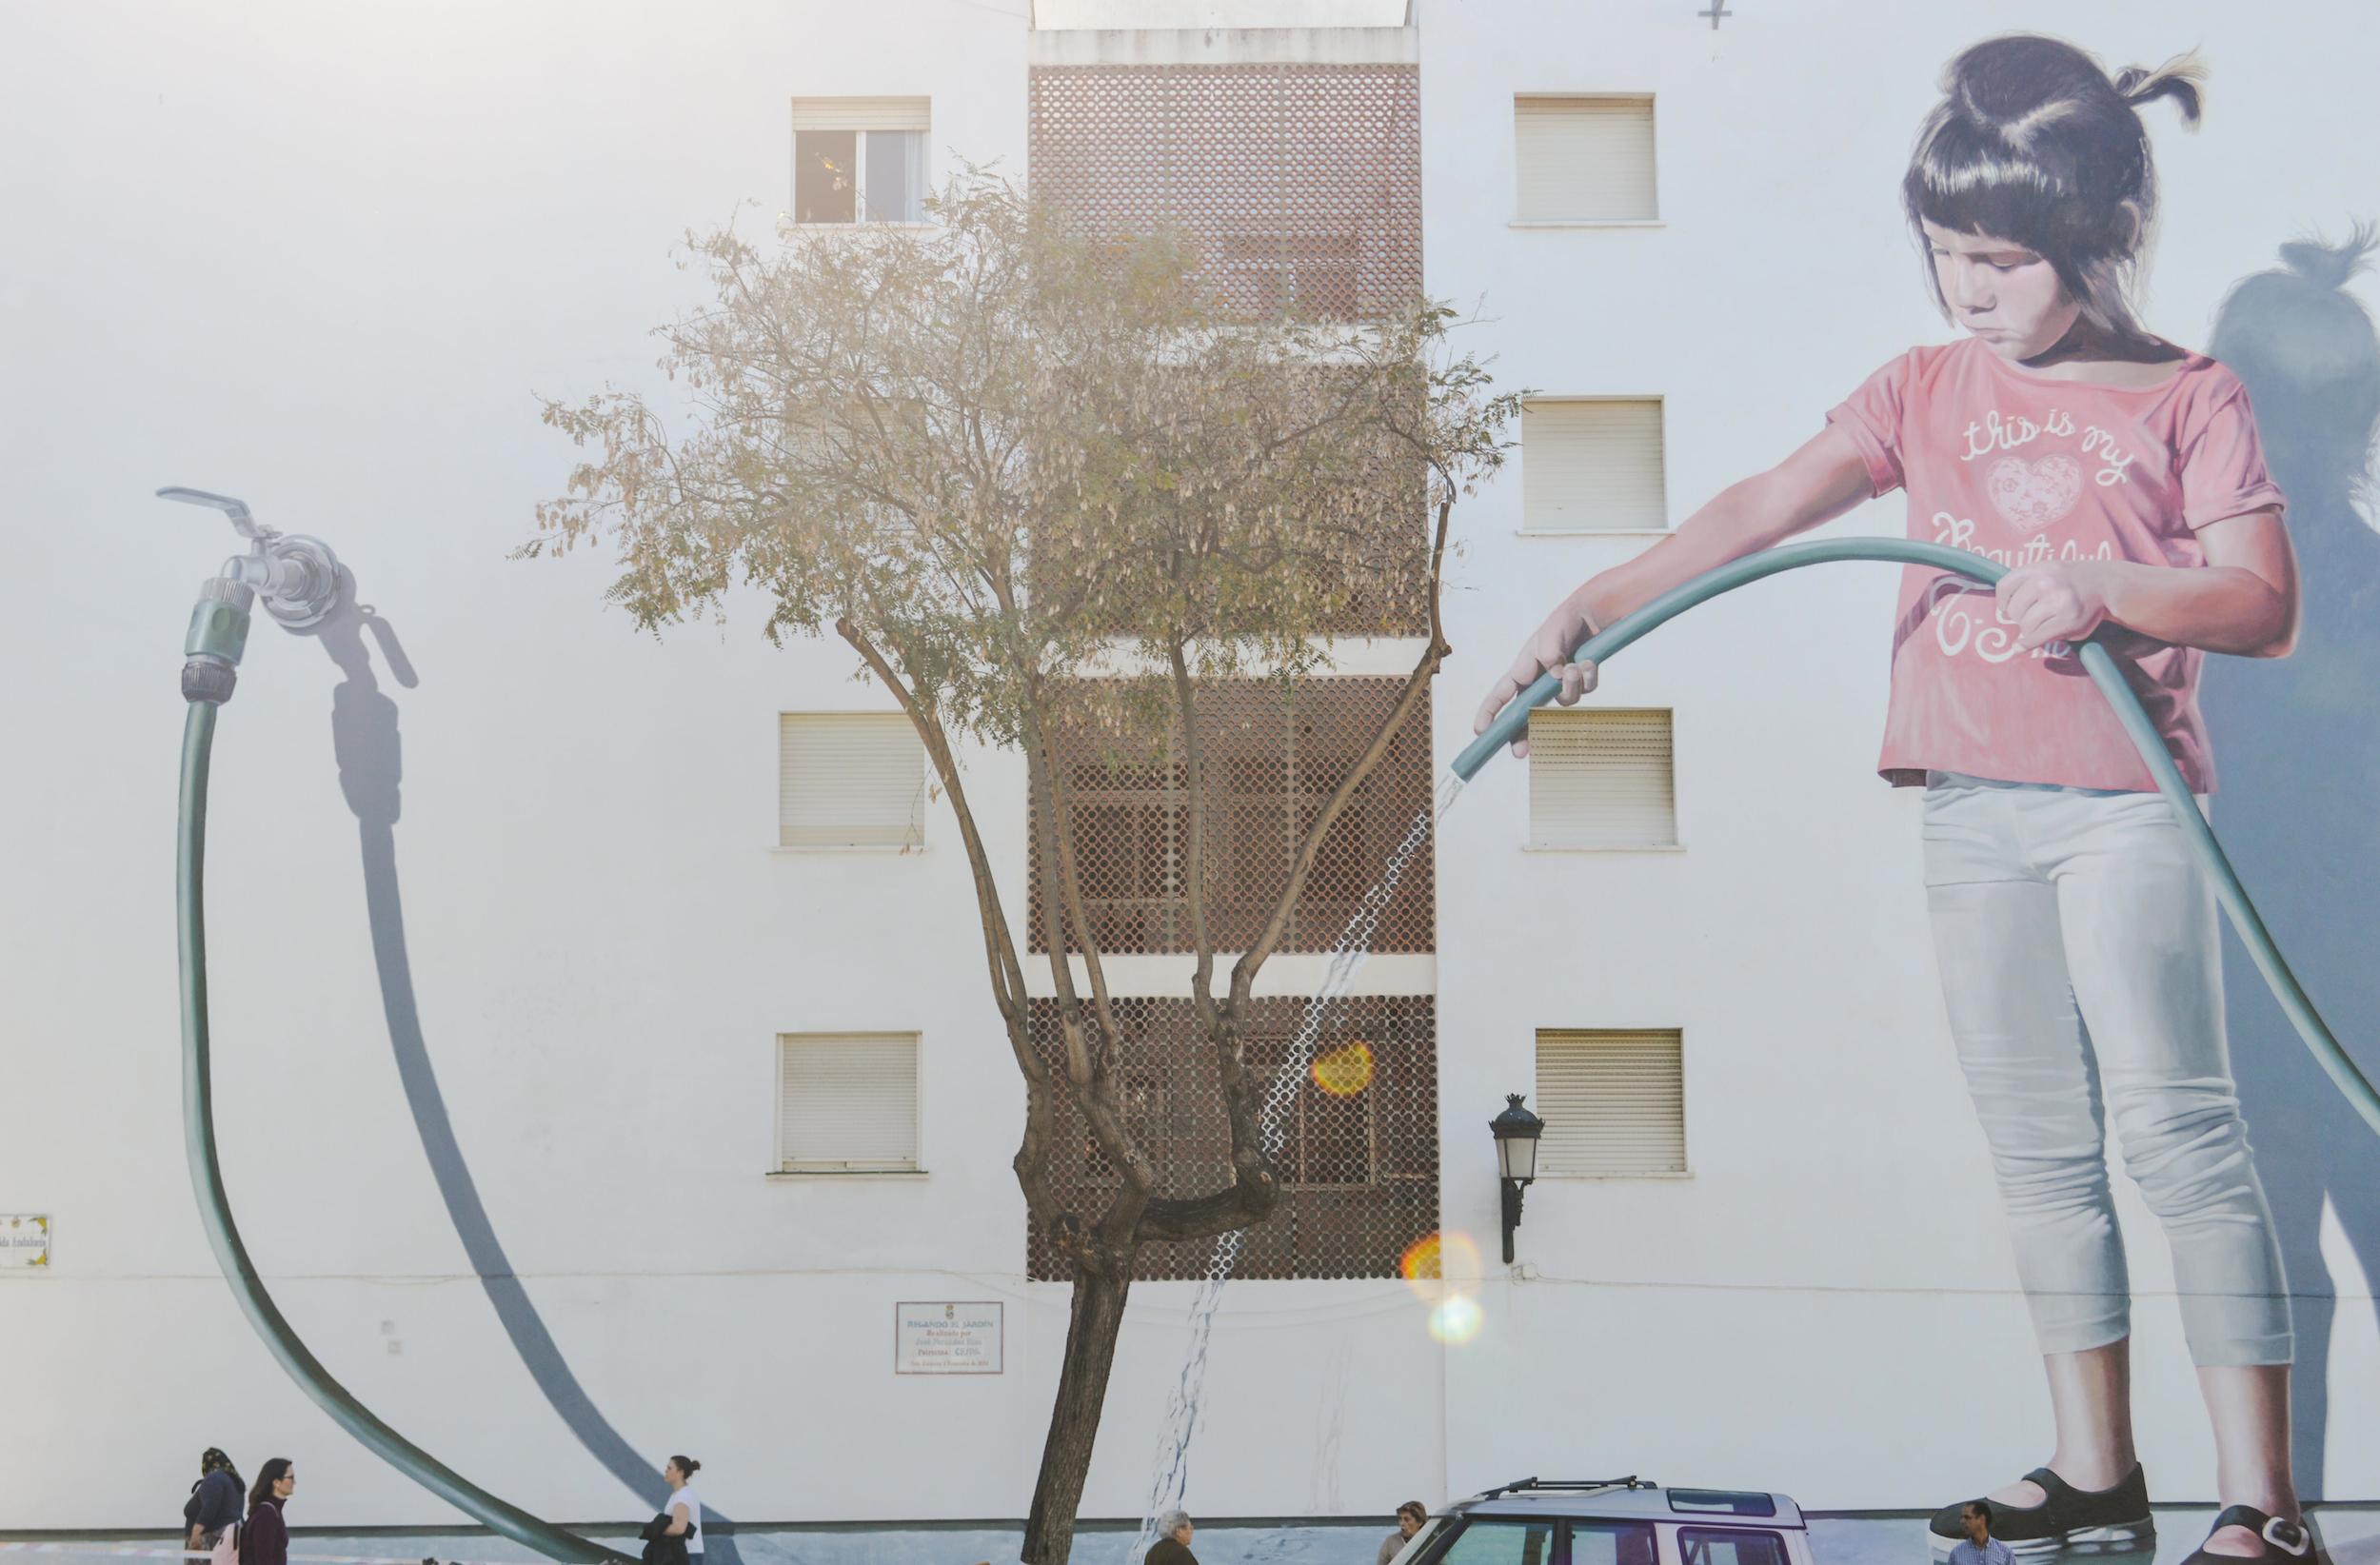 Estepona, une ville en plein essor